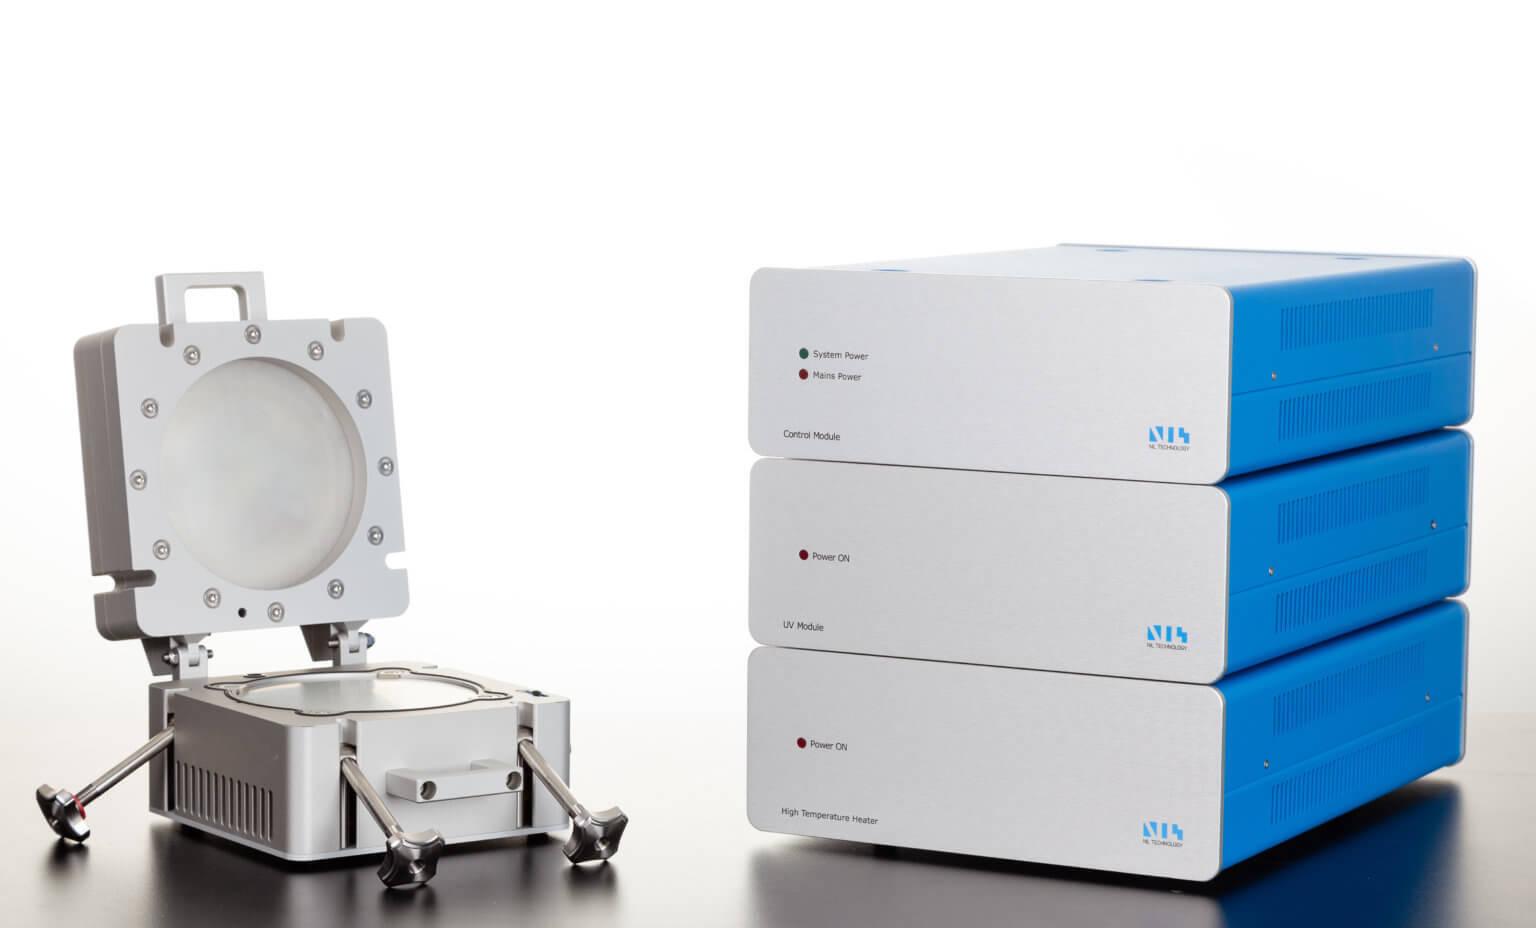 CNI v3.0, 120 mm version